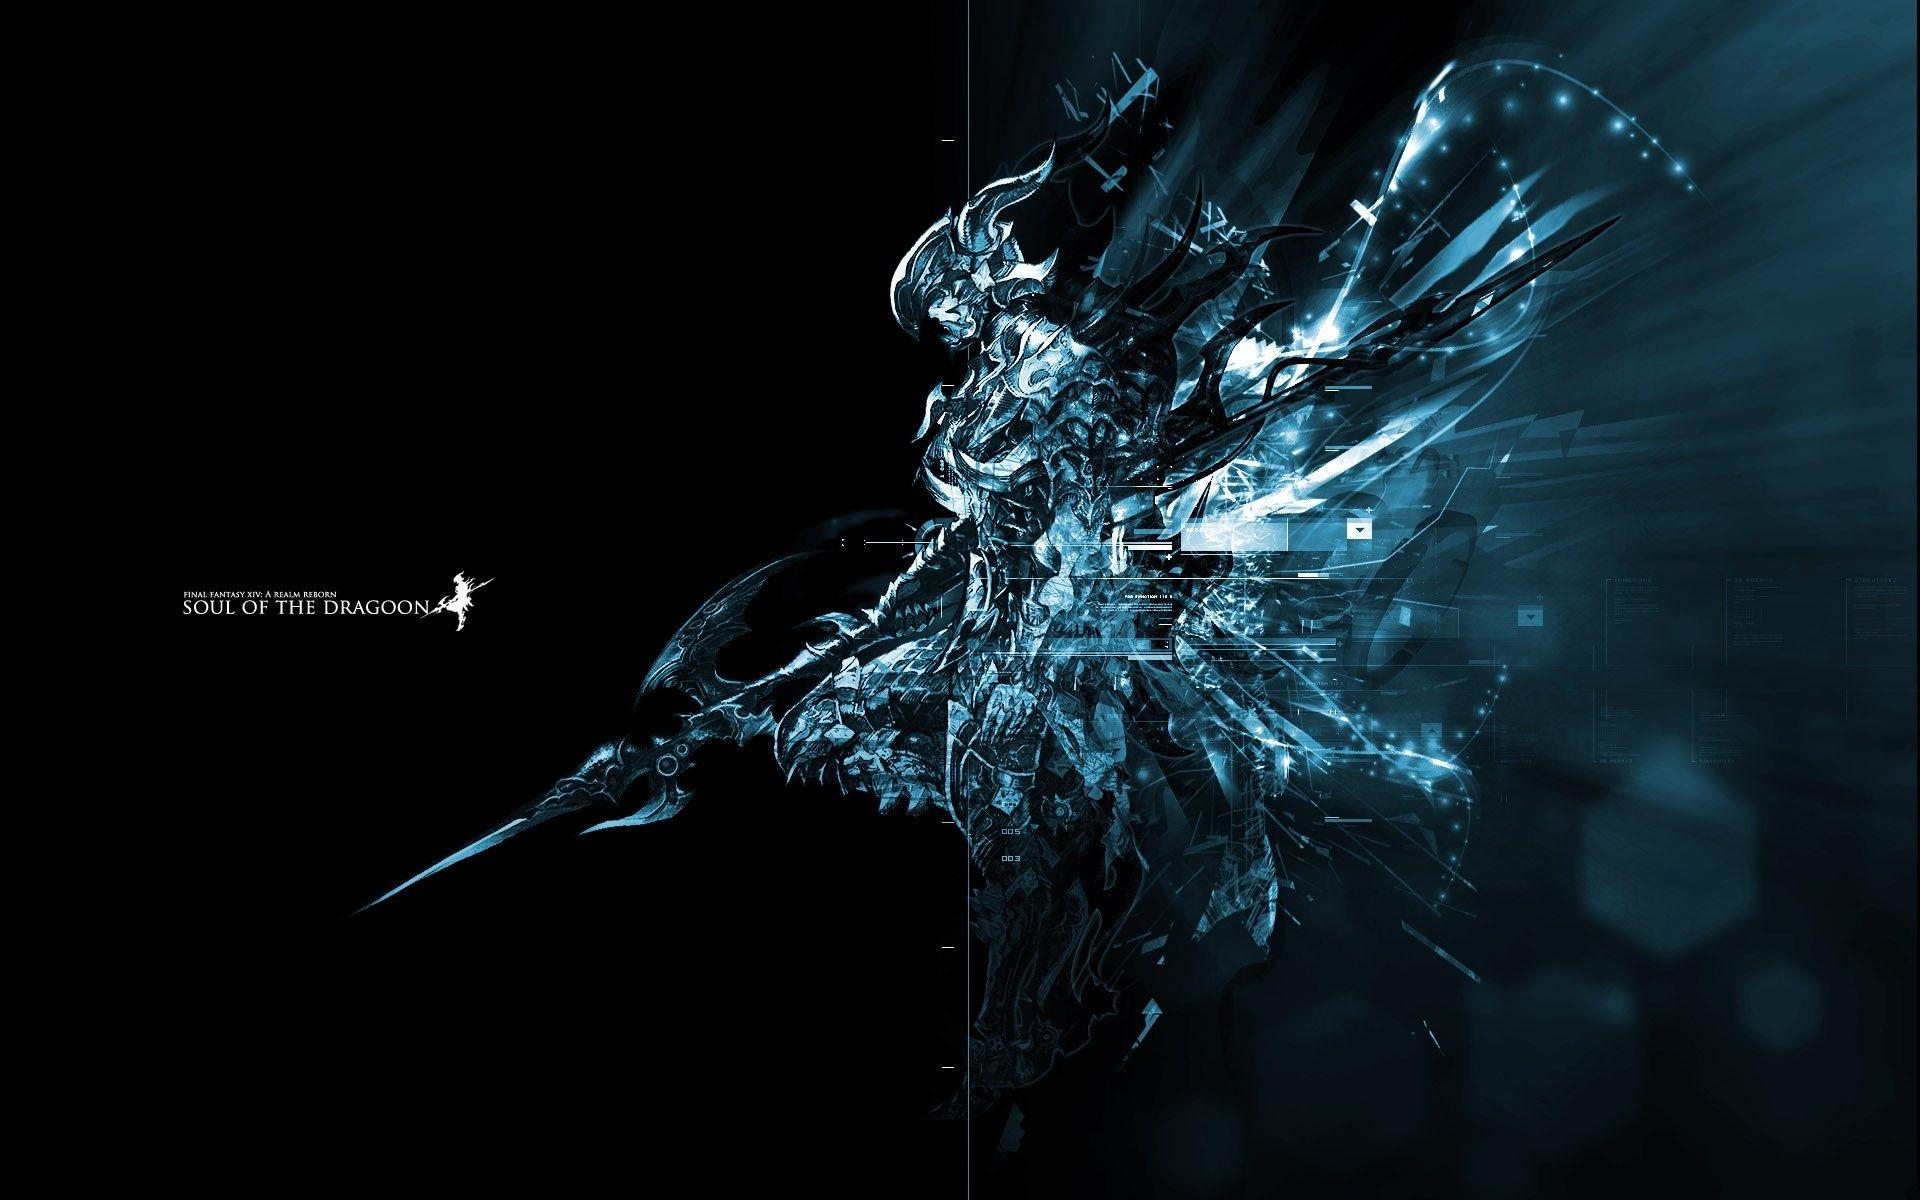 Ffxiv Hd Image Final Fantasy Art Live Wallpapers Final Fantasy Xiv 1643102 Hd Wallpaper Backgrounds Download